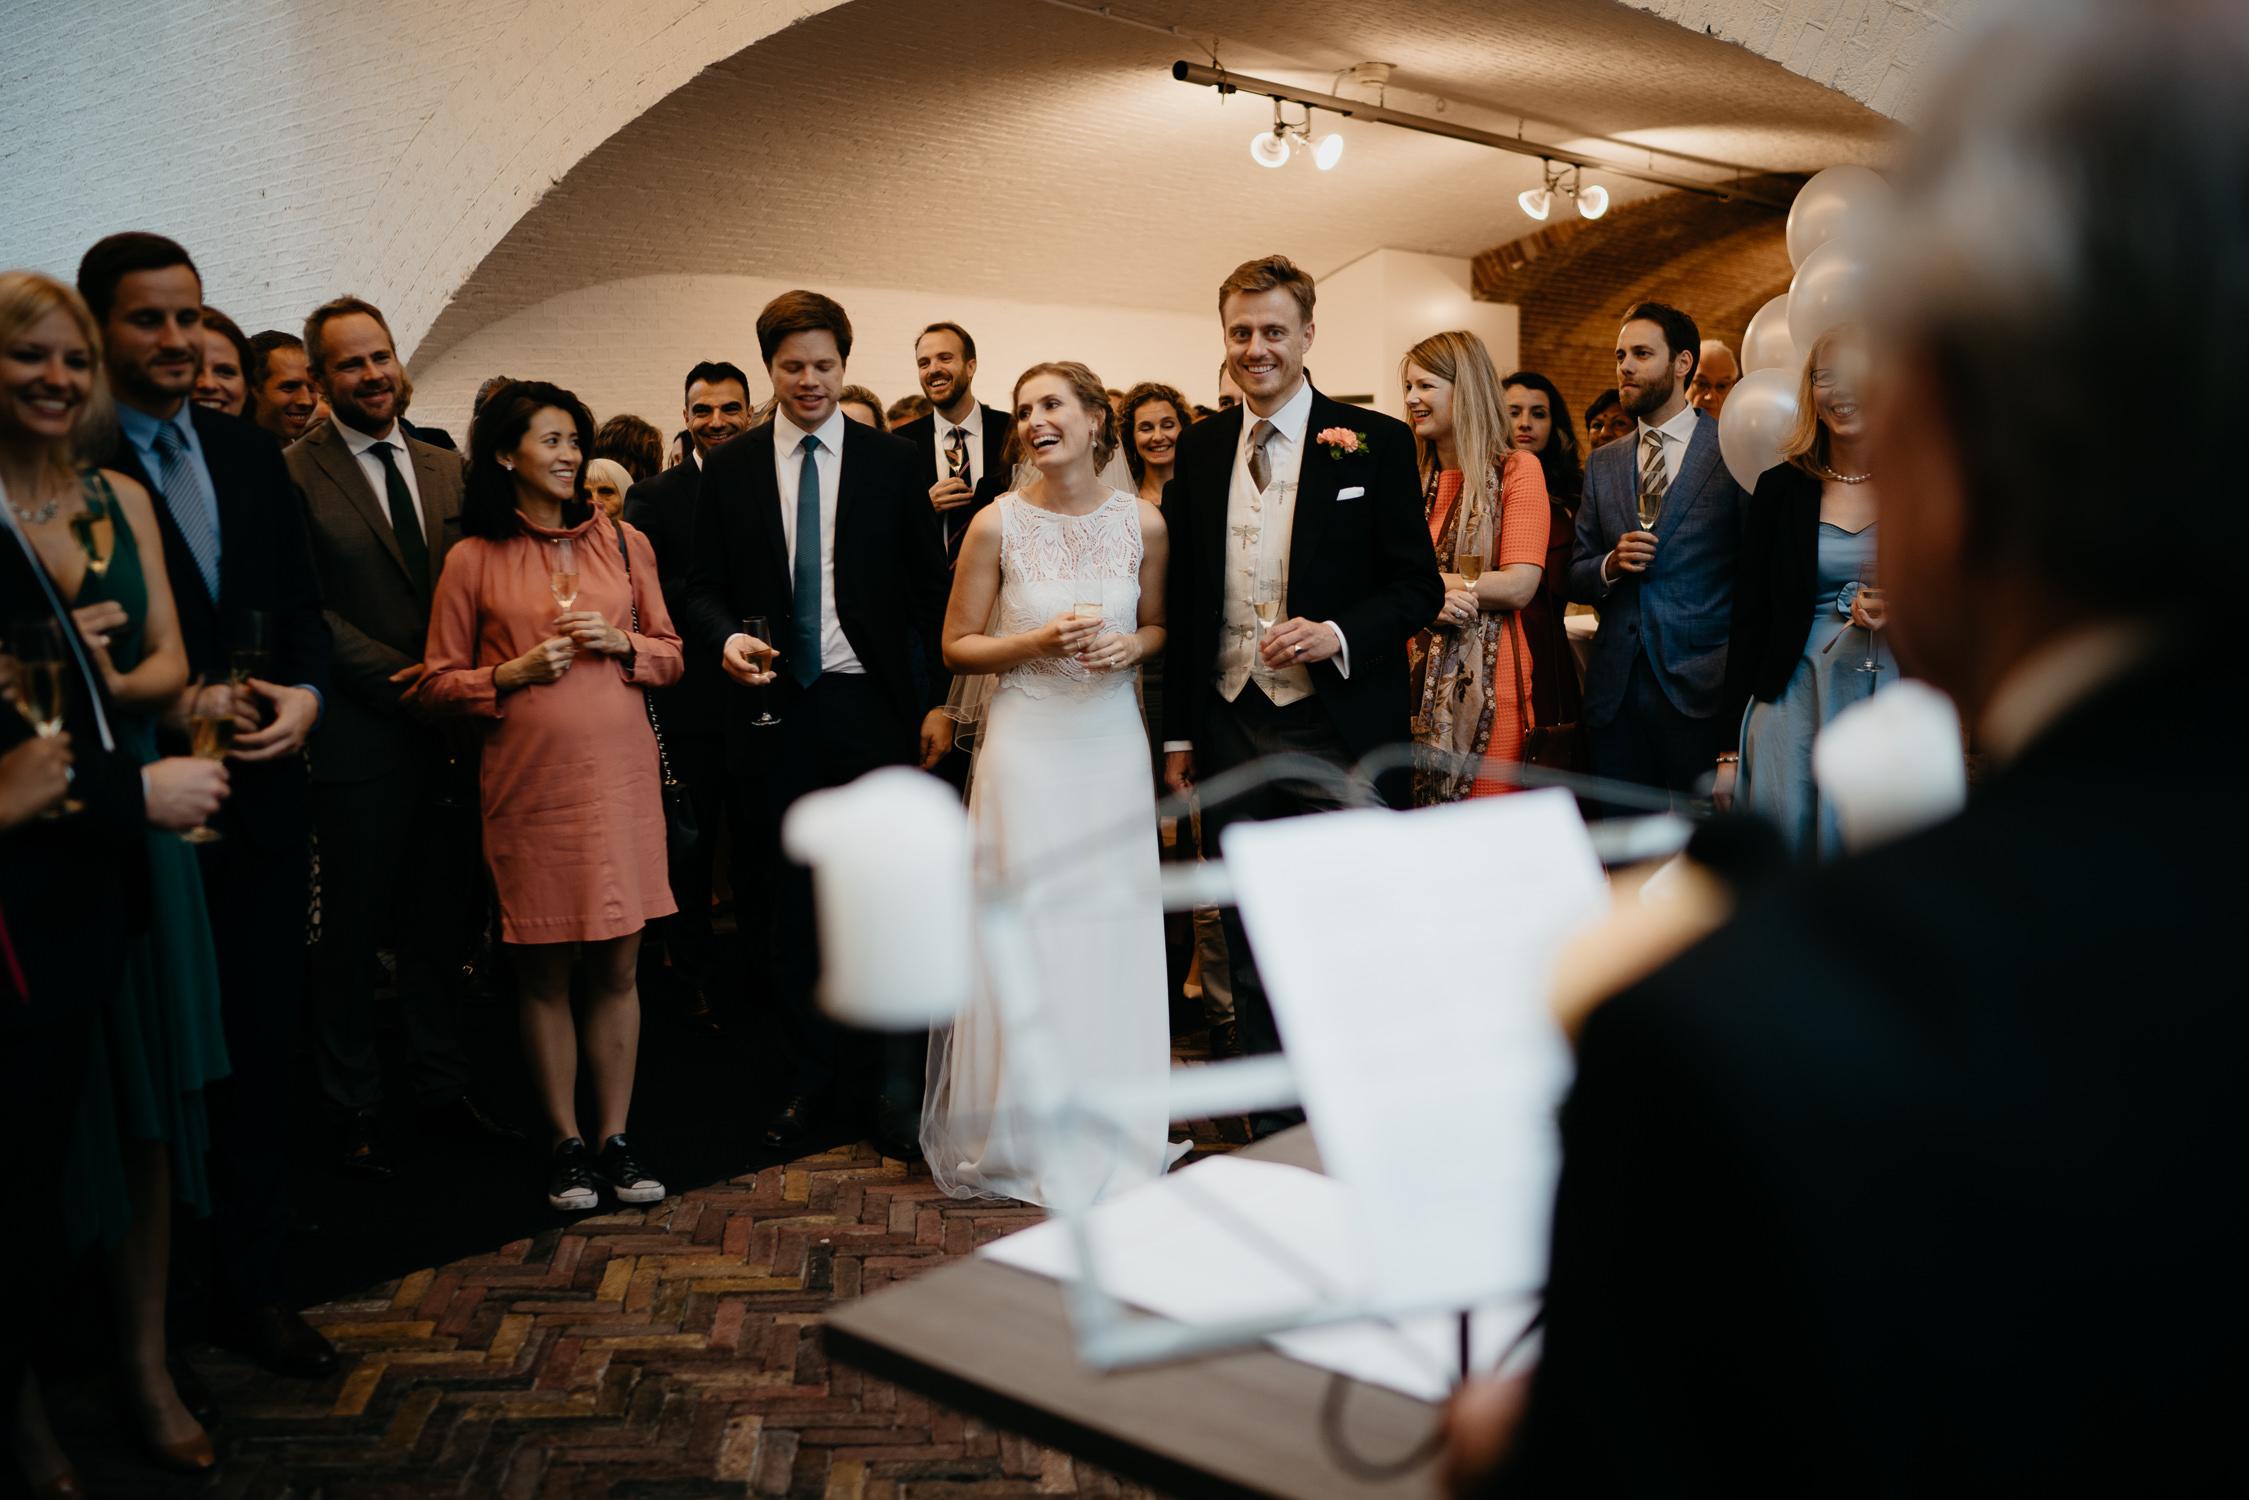 wedding reception dinner food photography